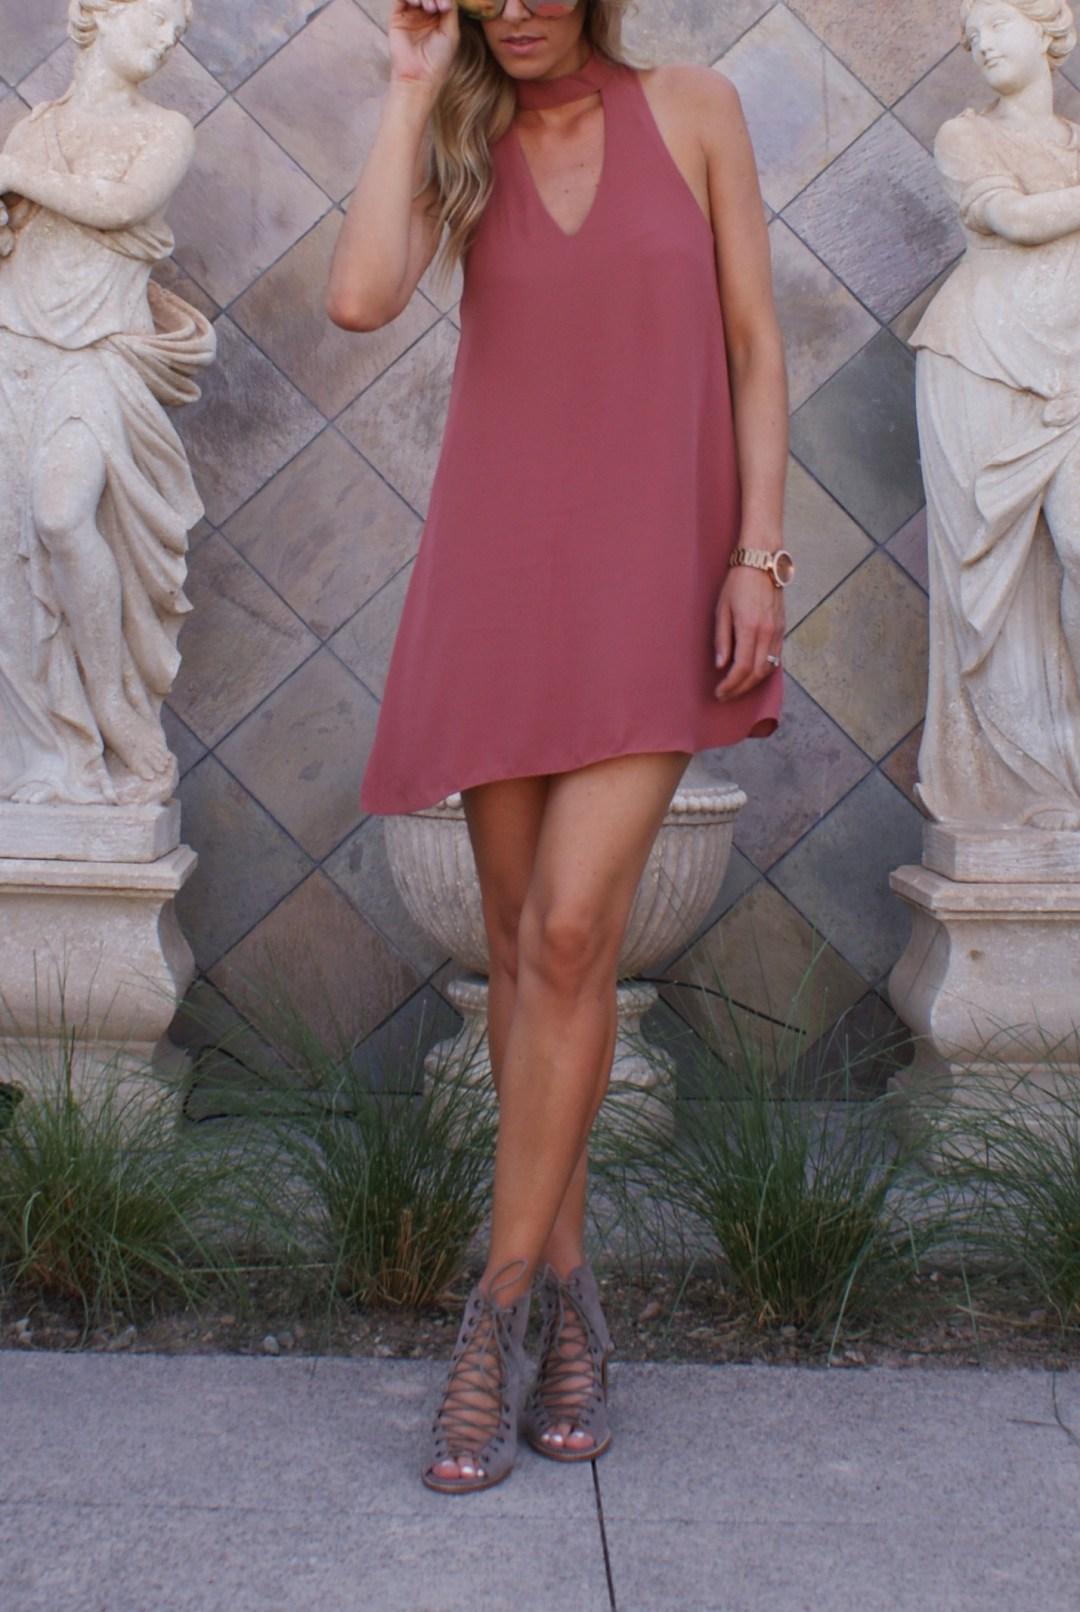 My Favorite Dress For Spring: Under $50!- Diariesofdanielle.com